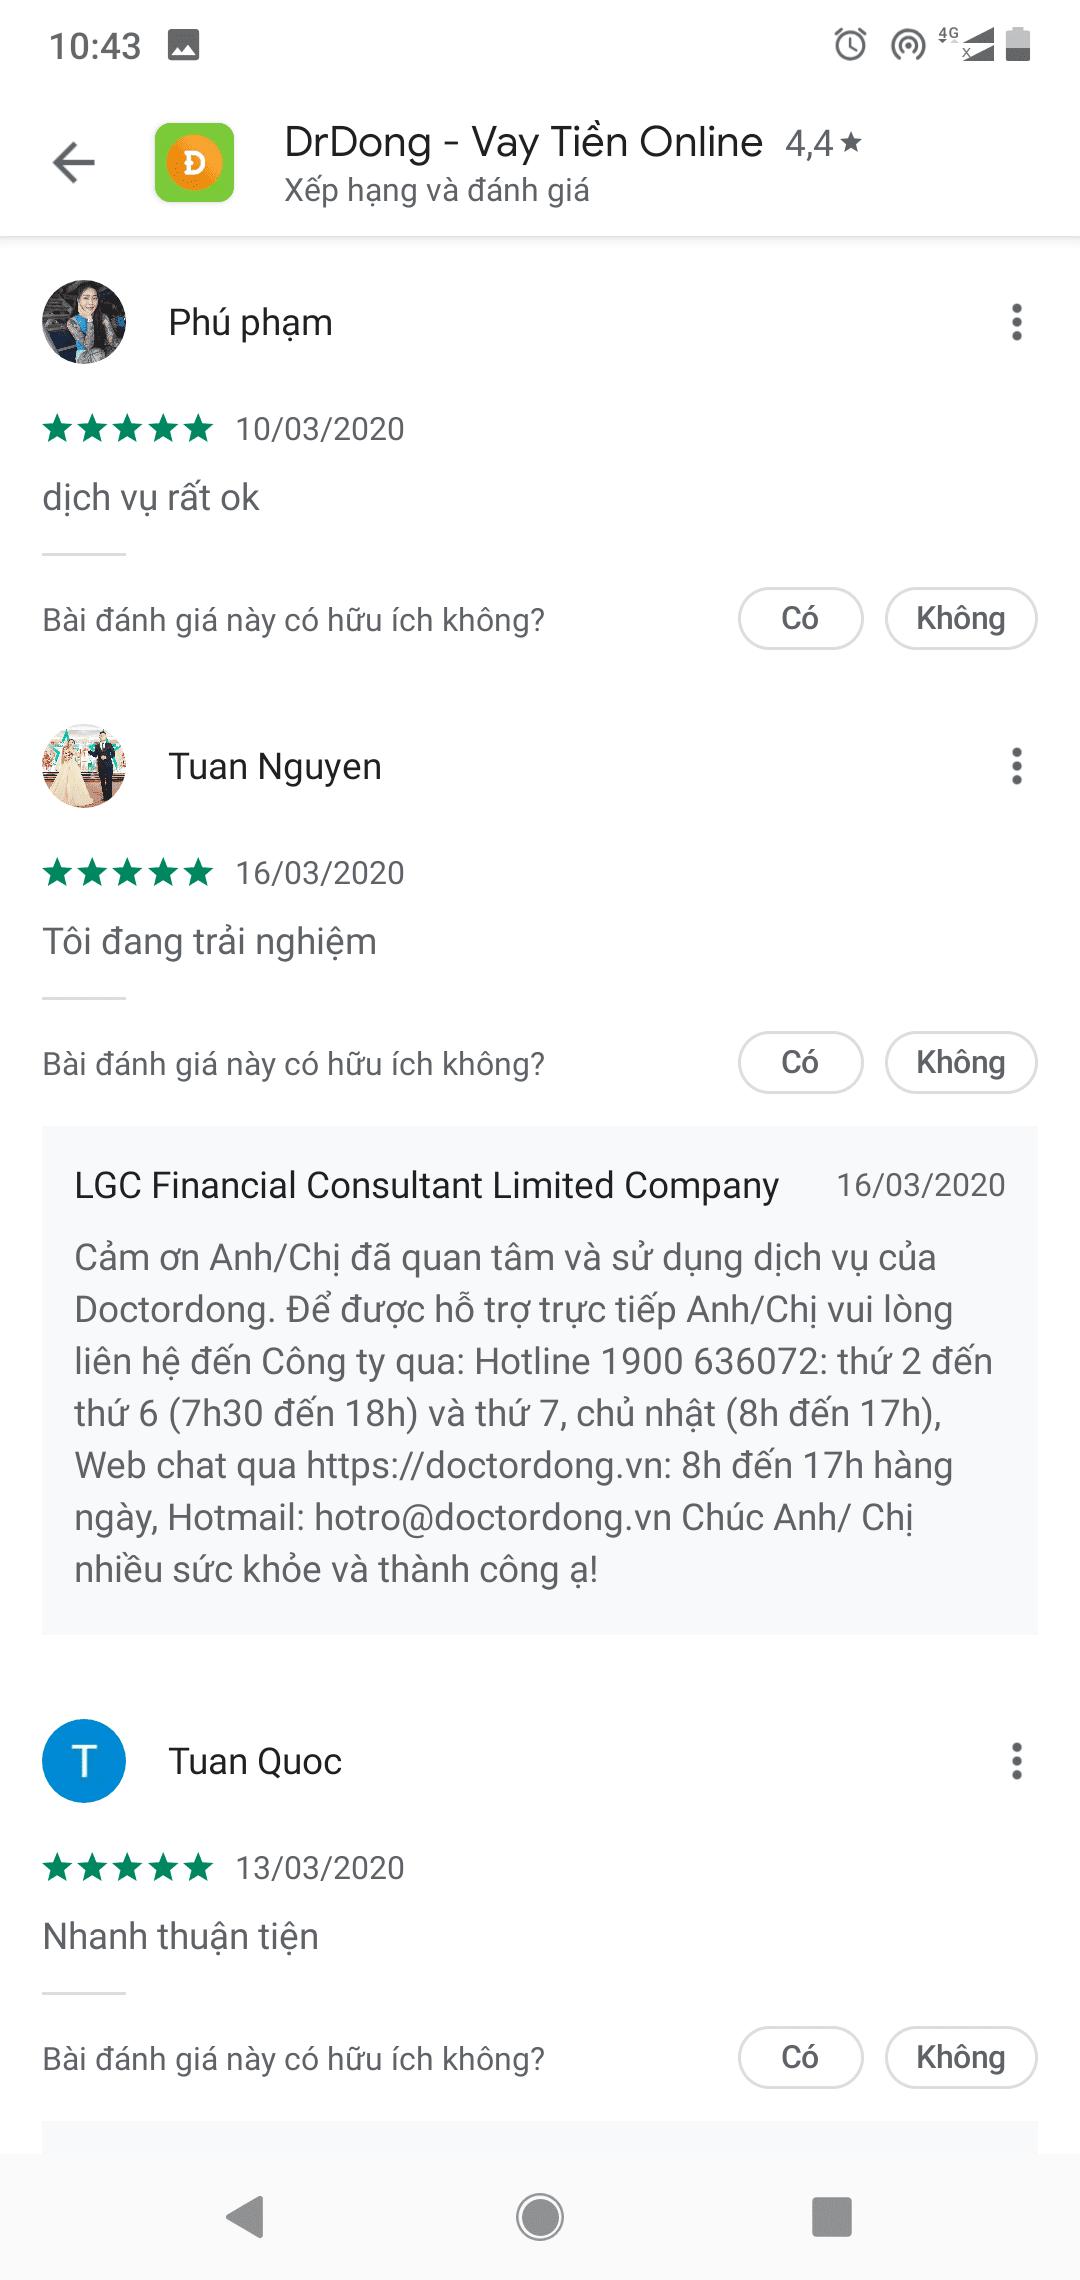 vphan-hoi-cua-khach-hang-ve-Doctor-dong